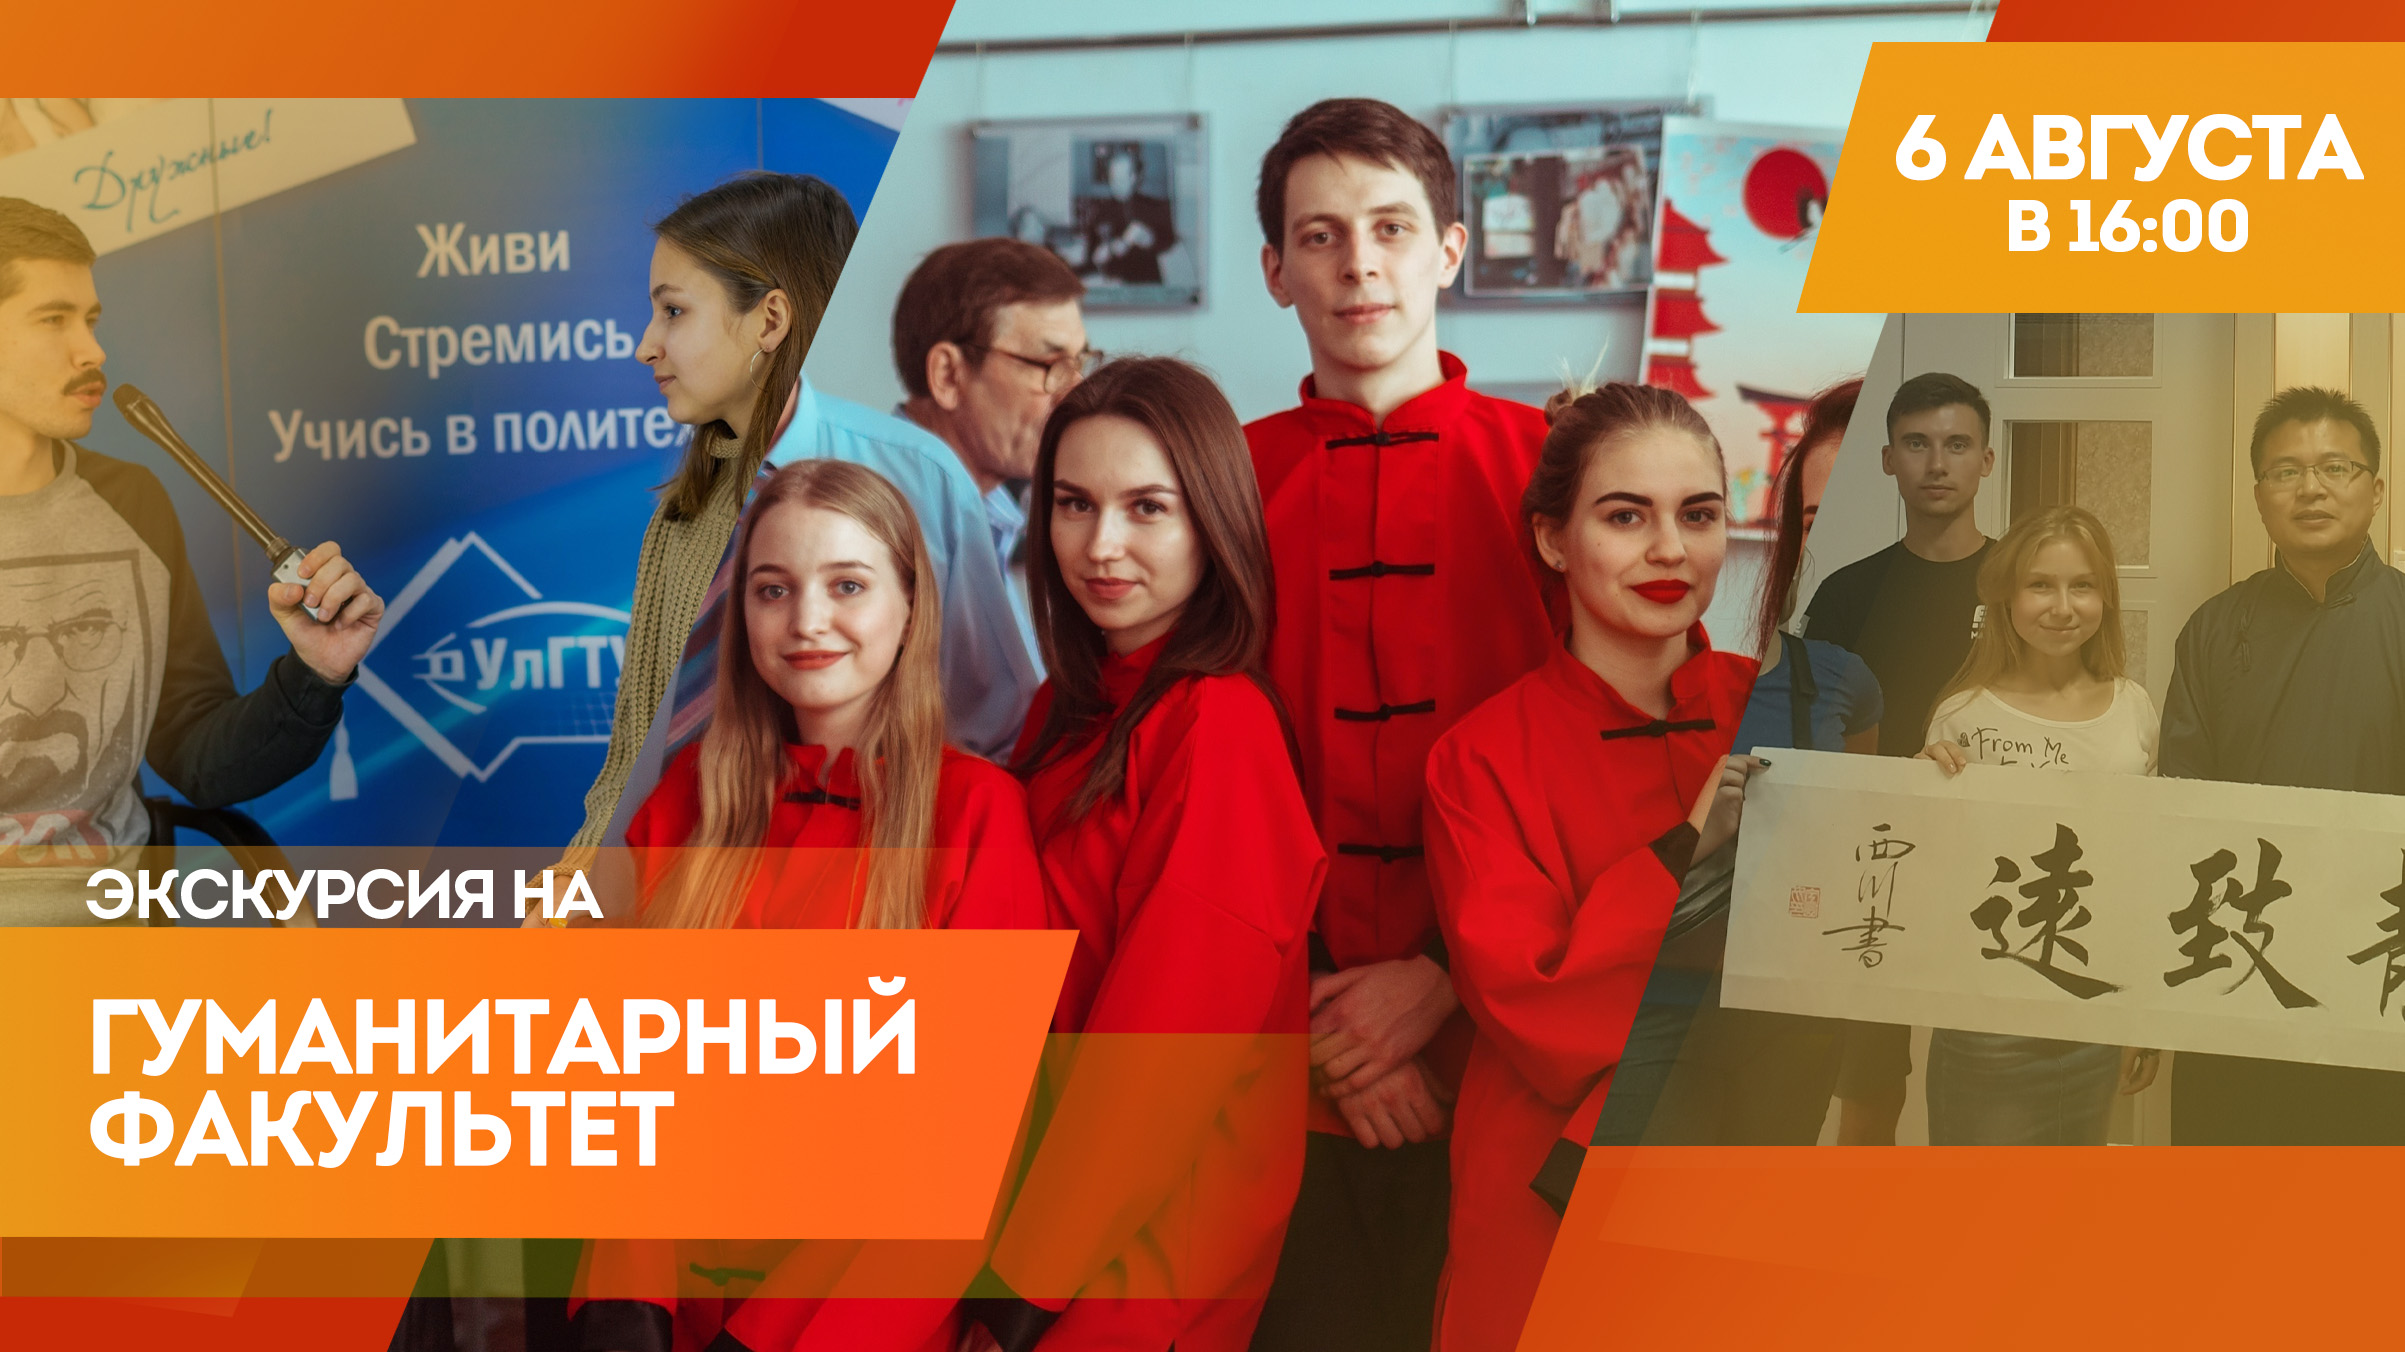 Онлайн-экскурсия на гуманитарный факультет УлГТУ